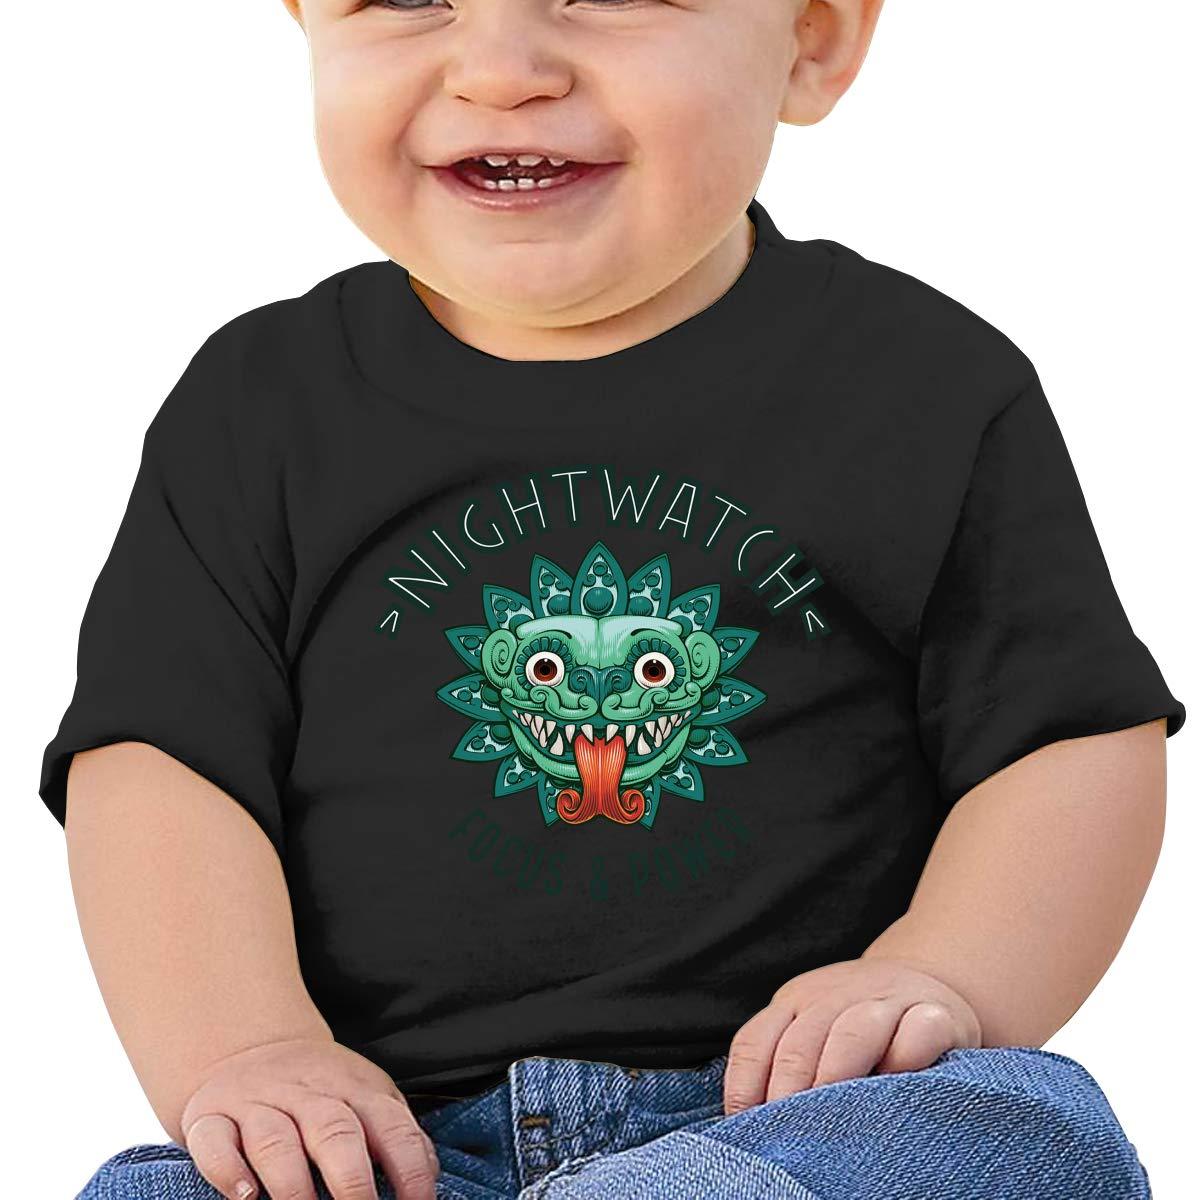 Hazhisha Nightwatch Baby T-Shirt with Round Collar and Pure Cottonblack